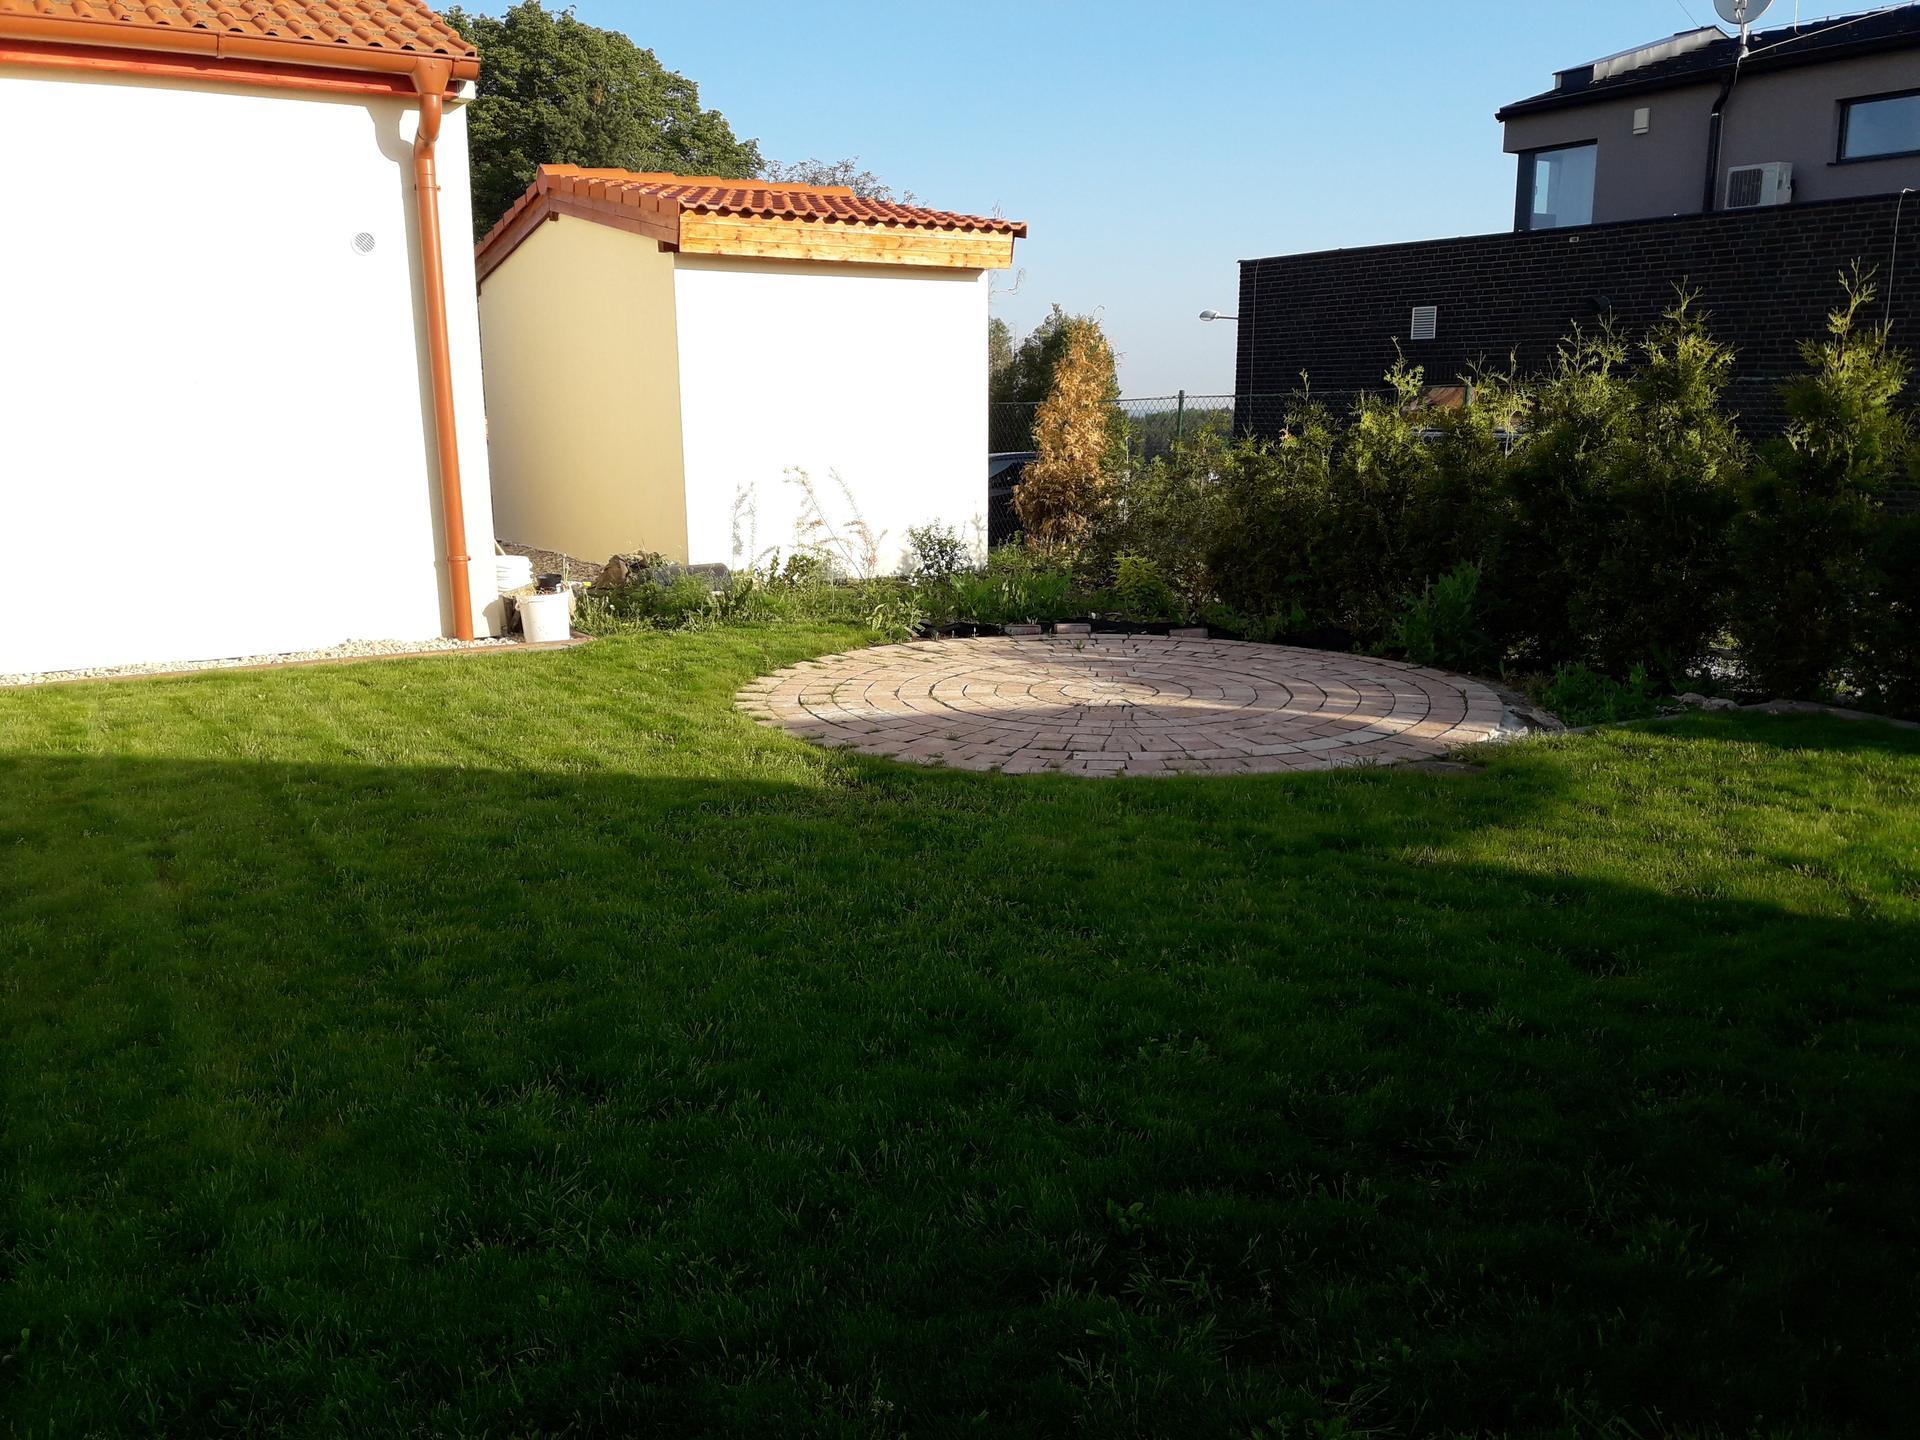 Zahrada - Obrázek č. 67